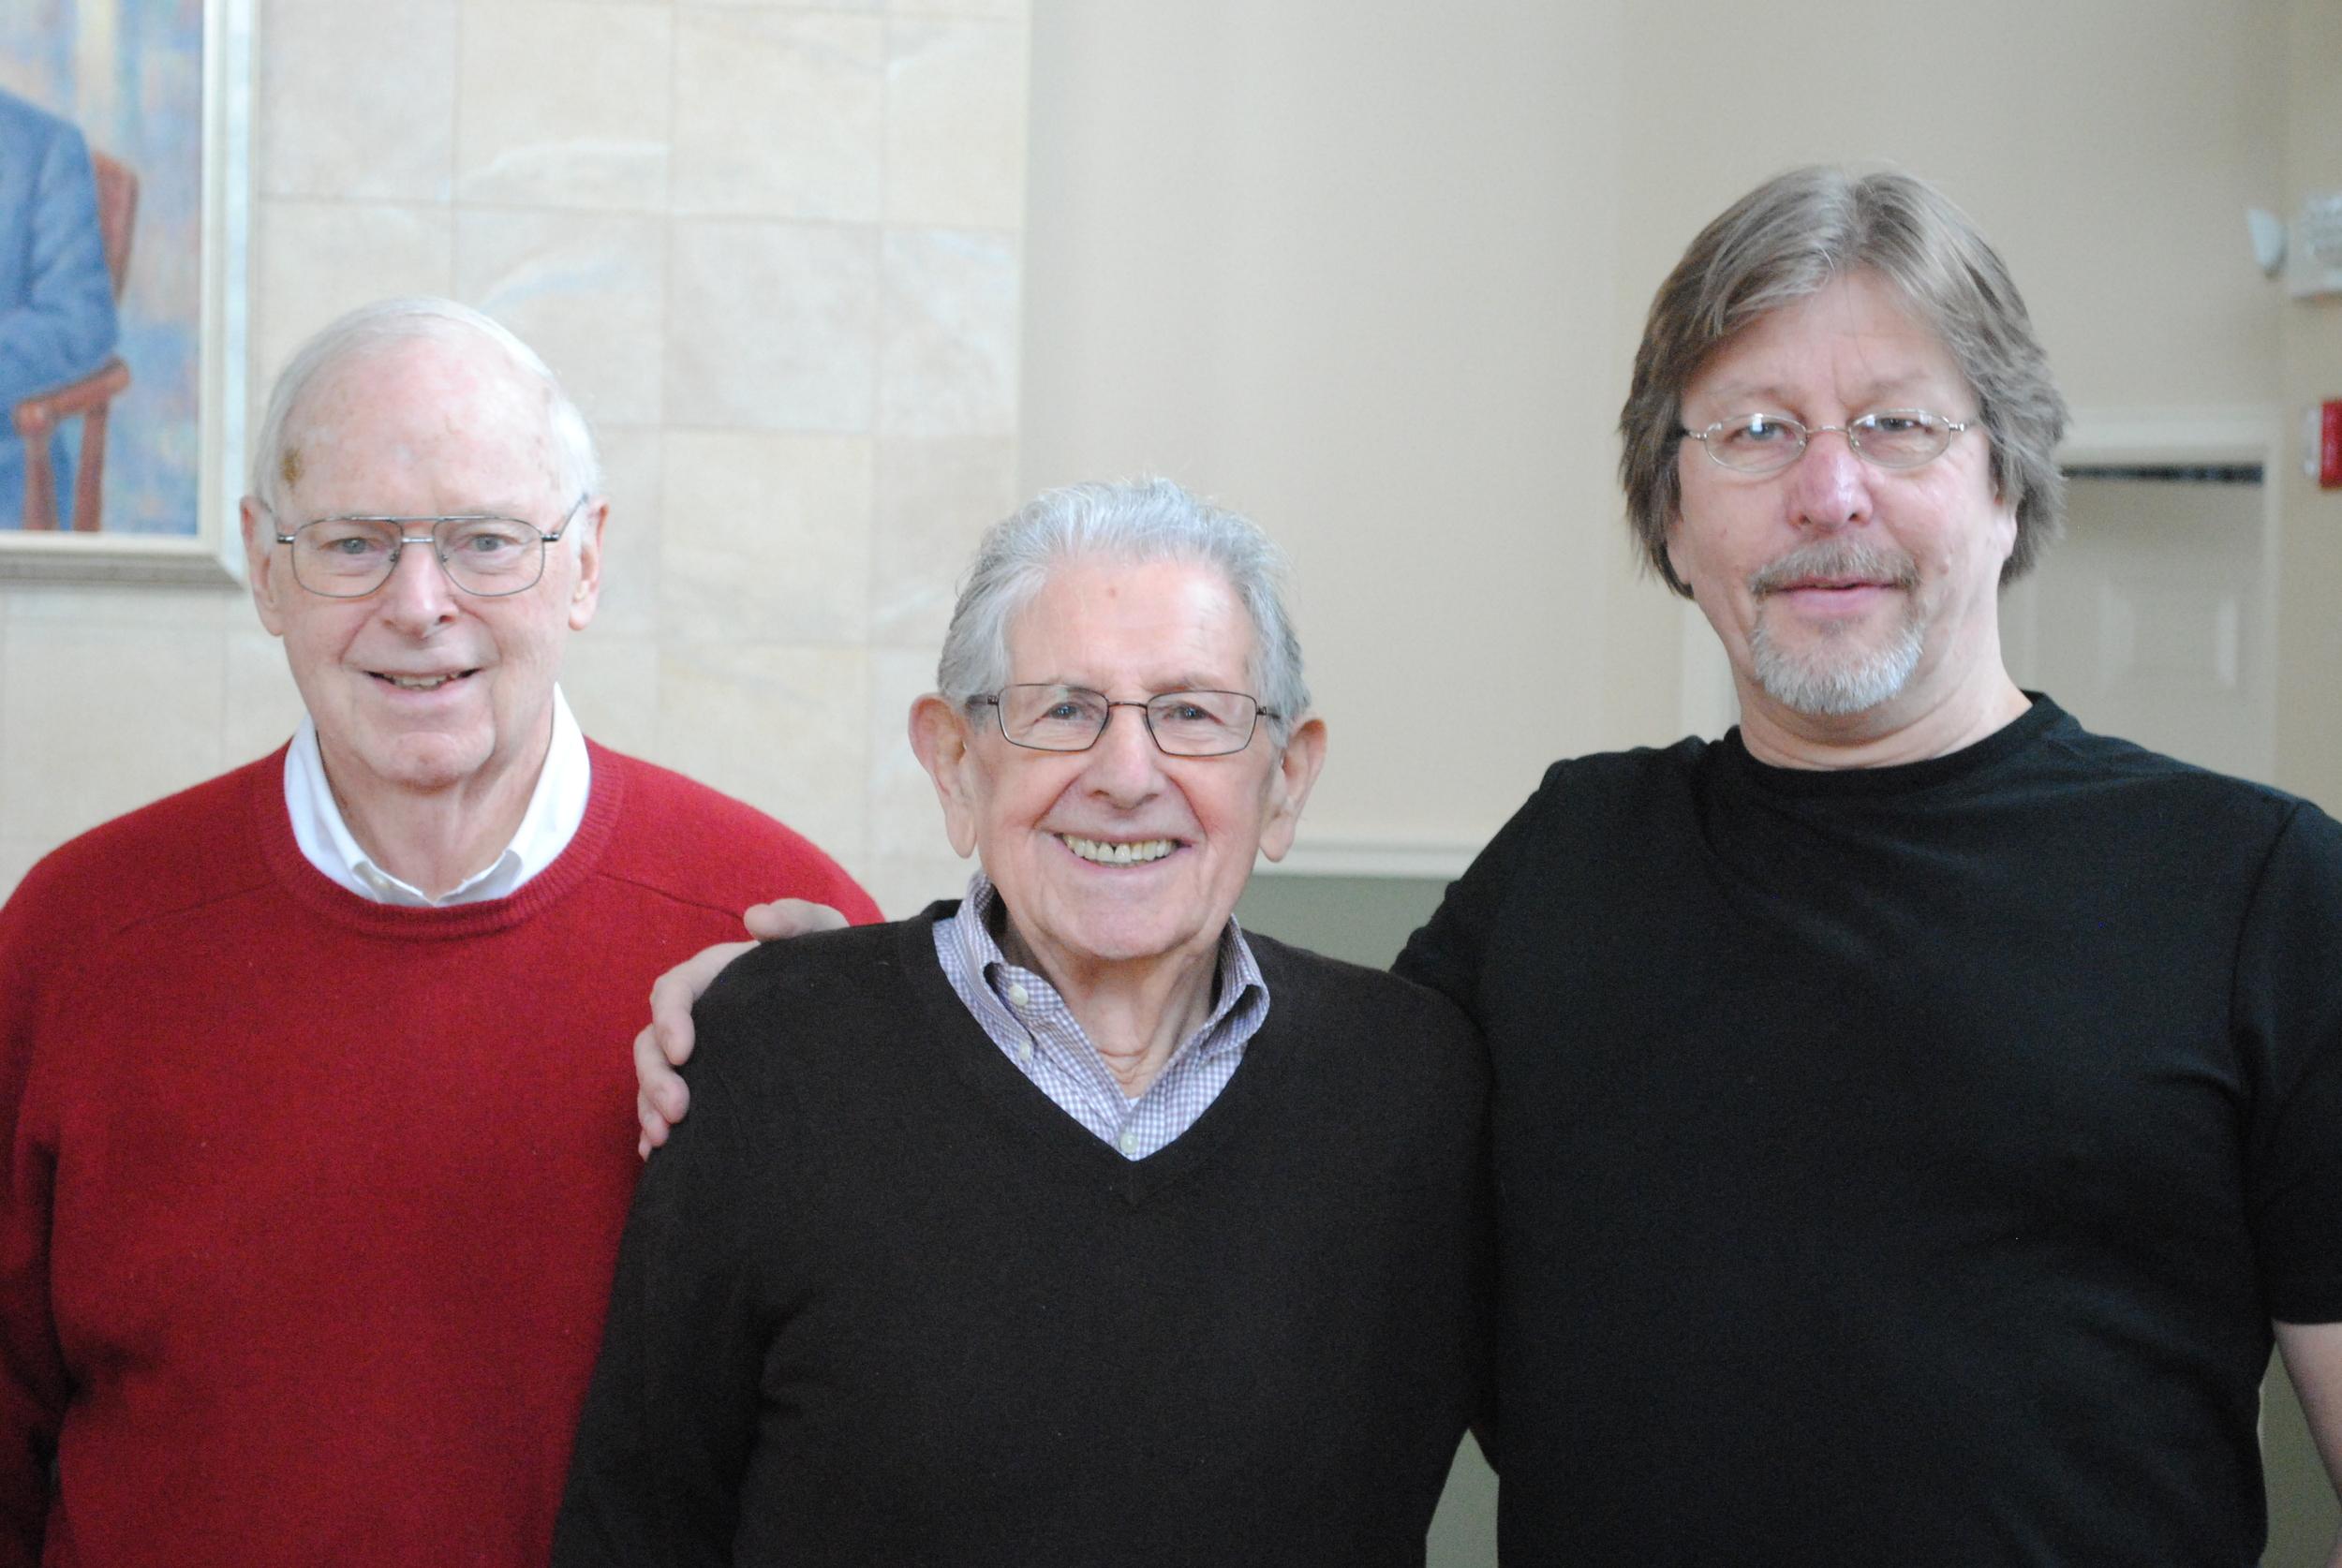 Henry Bawnik, Reed Taylor, & Michael Mietlicki.JPG